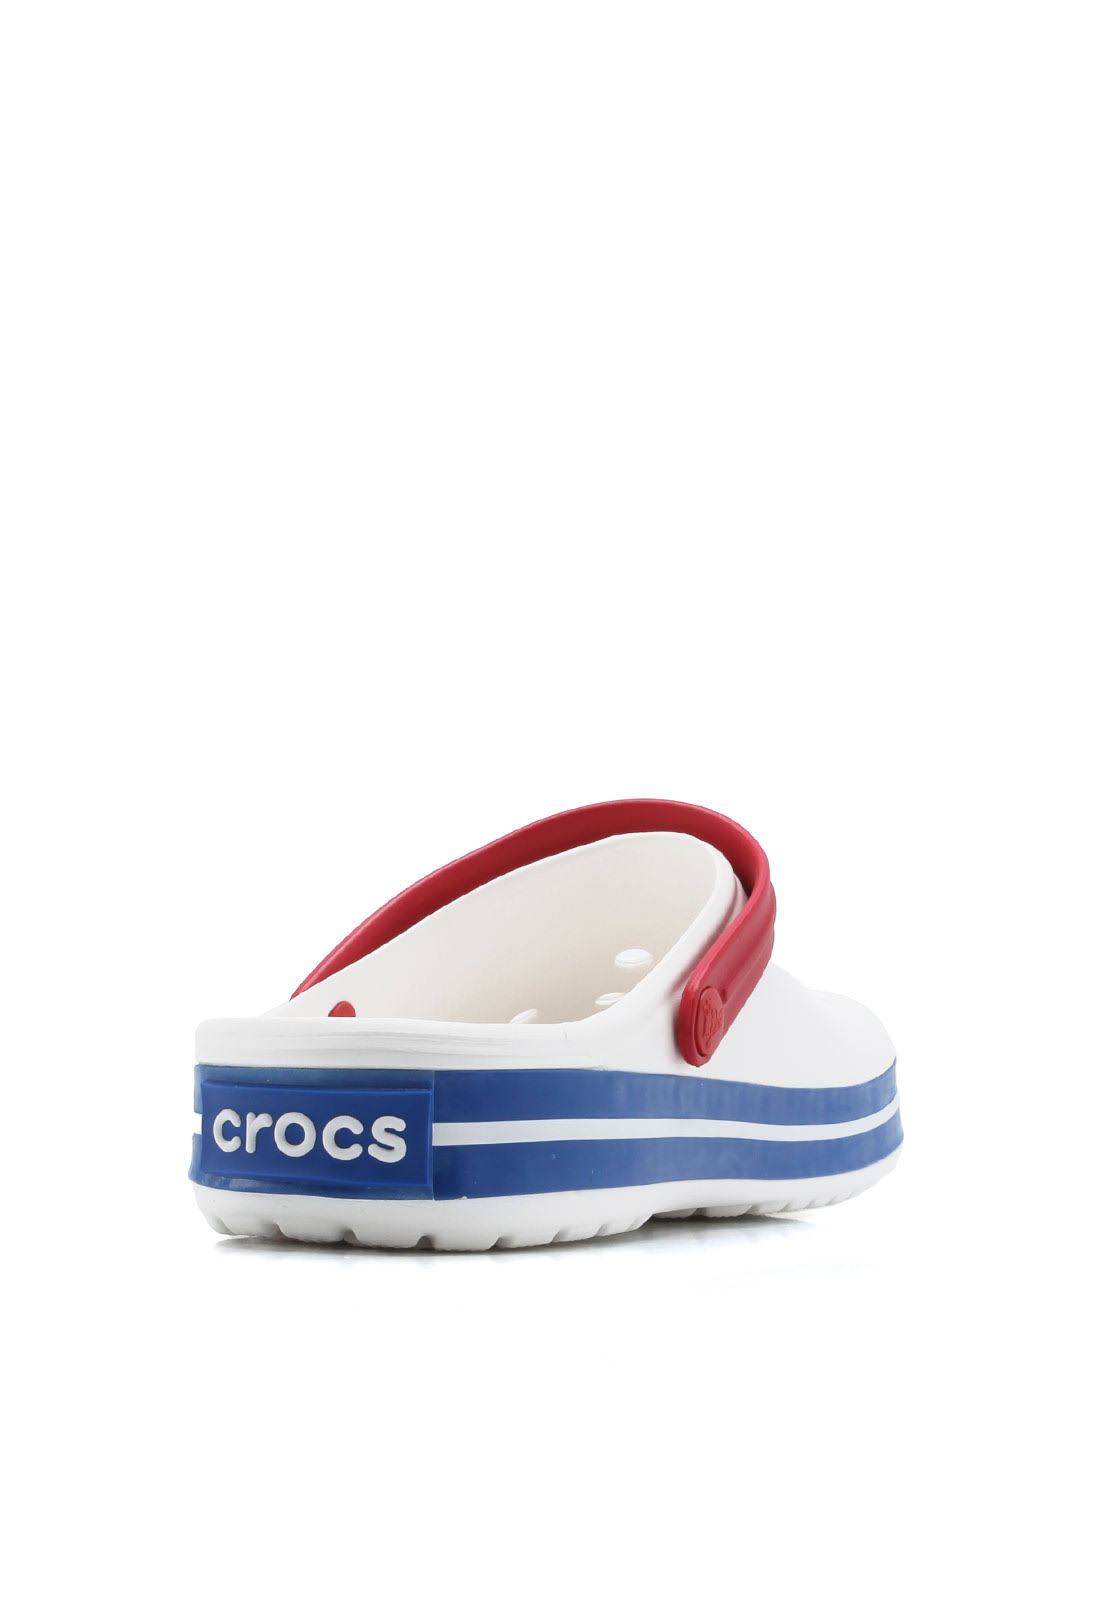 Crocband Bianco SandalUnisex Crocs RoyalJean Blu 8n0OkPw